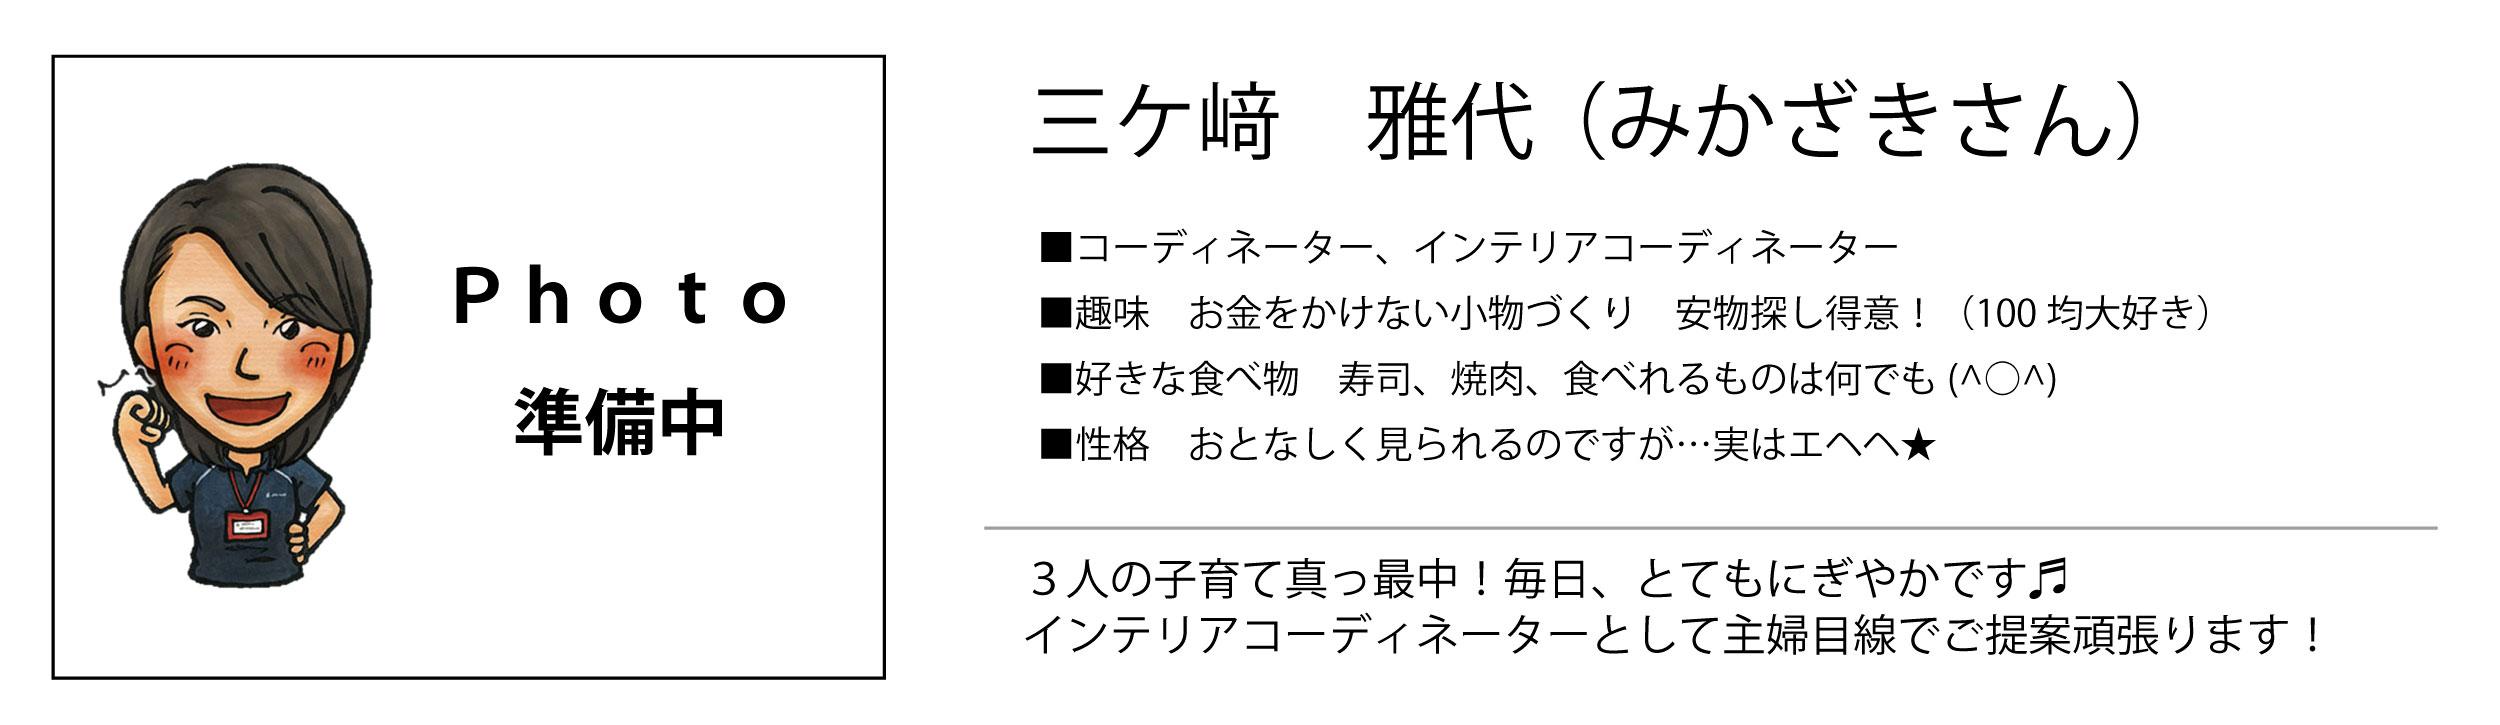 staff-mikazaki.jpg